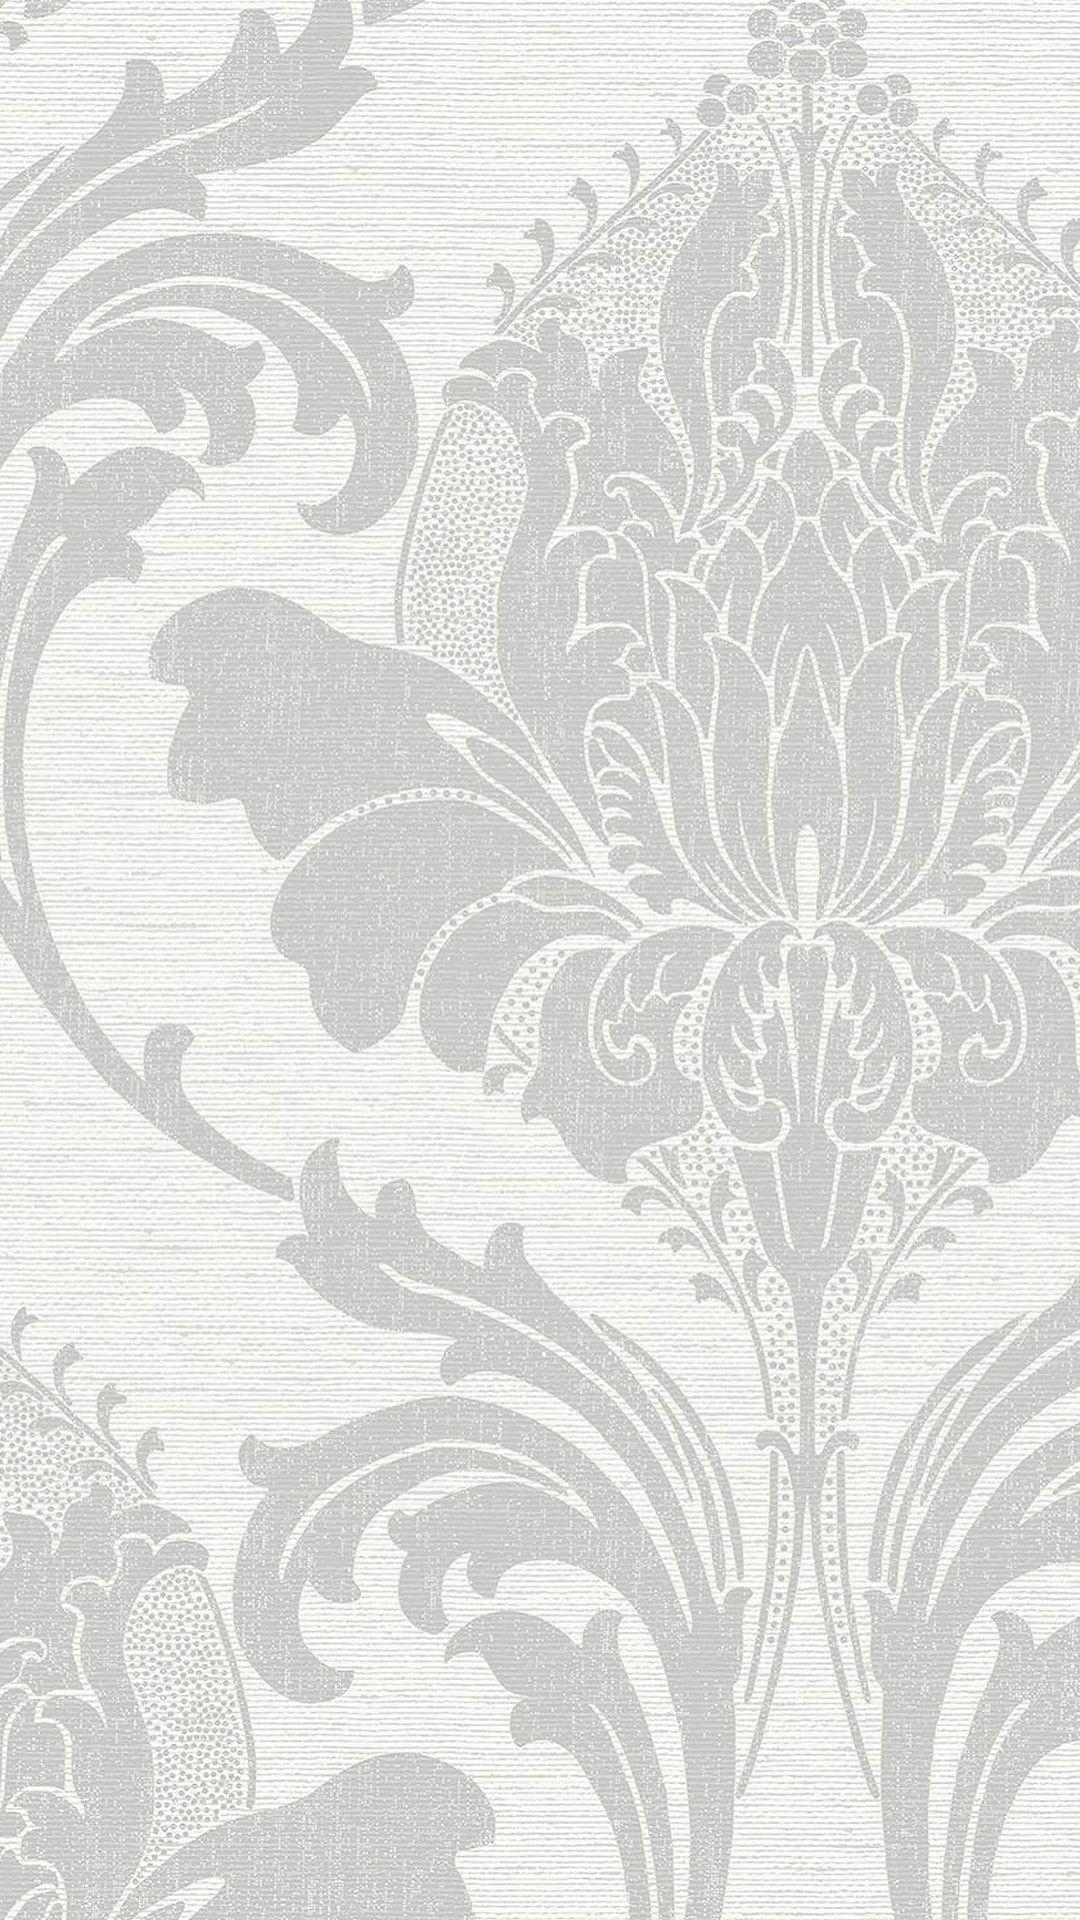 Wallpaper iPhone Grey 壁紙, おしゃれな壁紙背景, スマホ壁紙